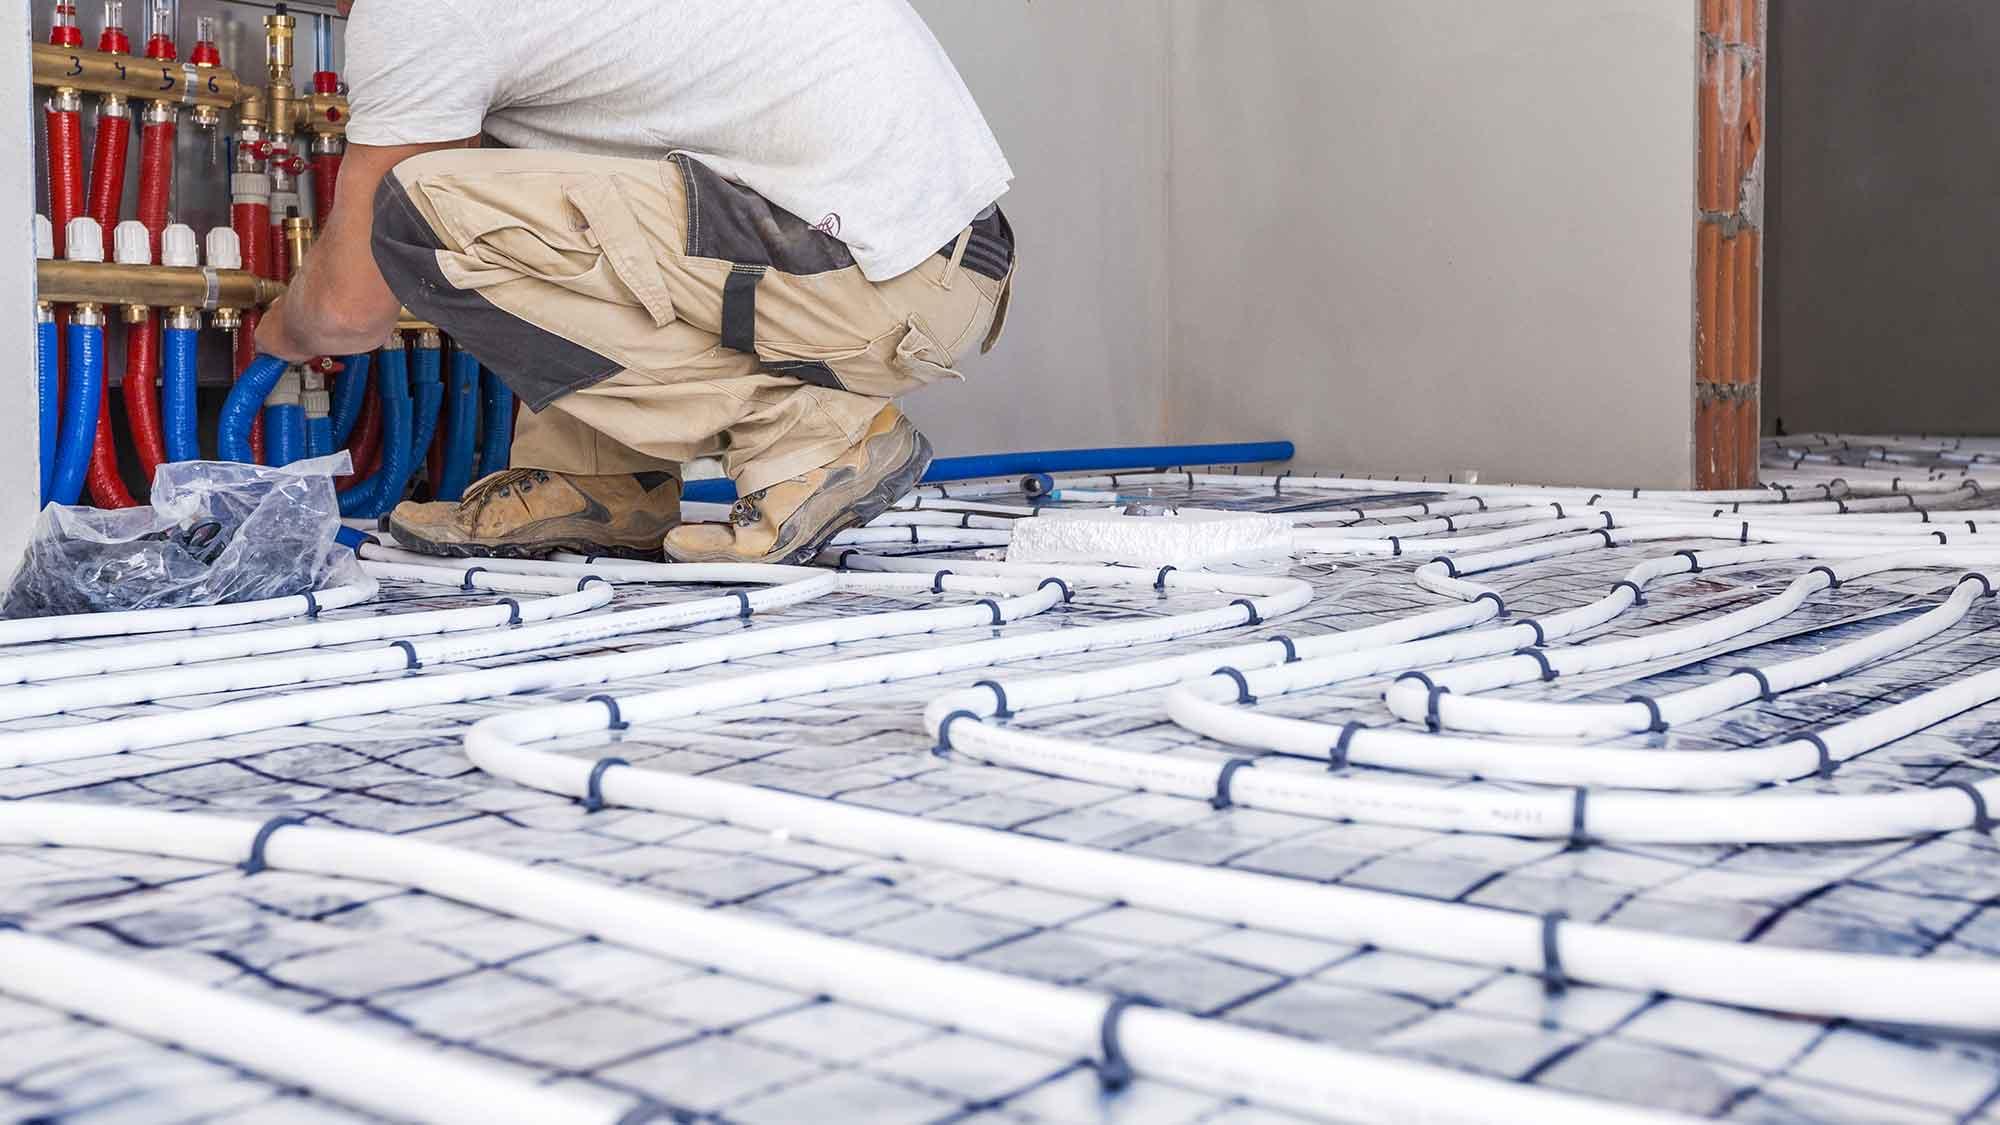 underfloor heating essex maintenance leigh on sea white